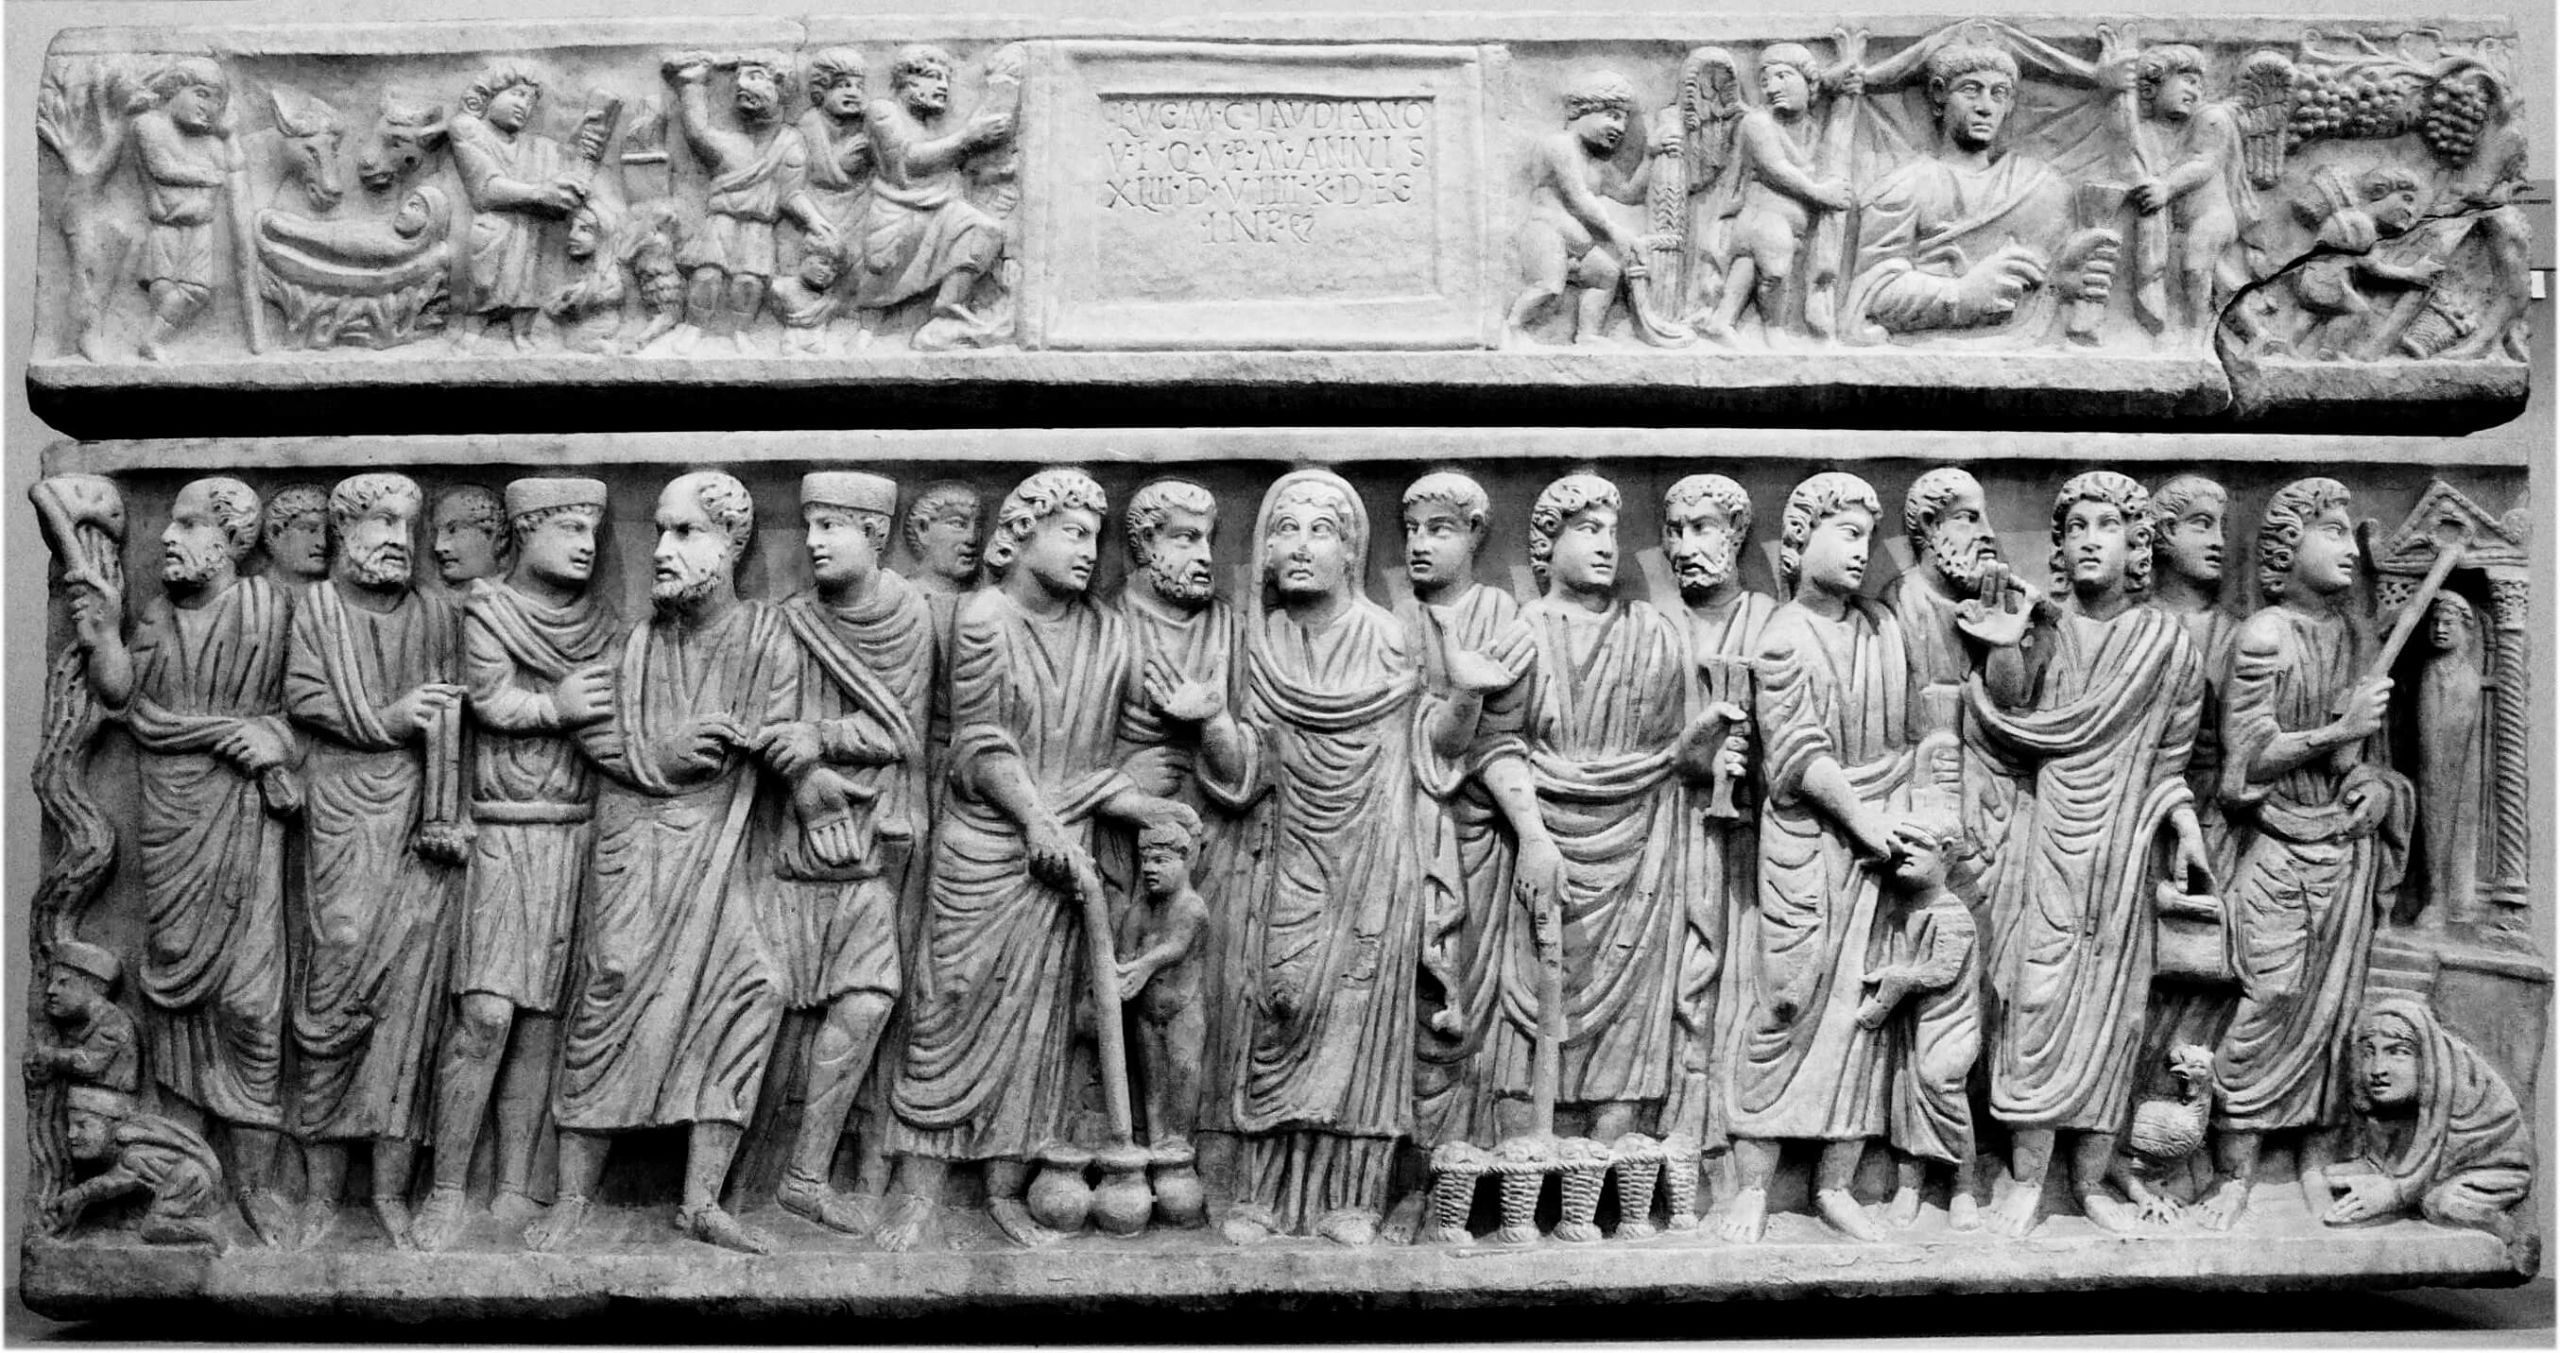 Sarcophagus of Claudio, ca 350, Museo Nazionale Romano, Rome